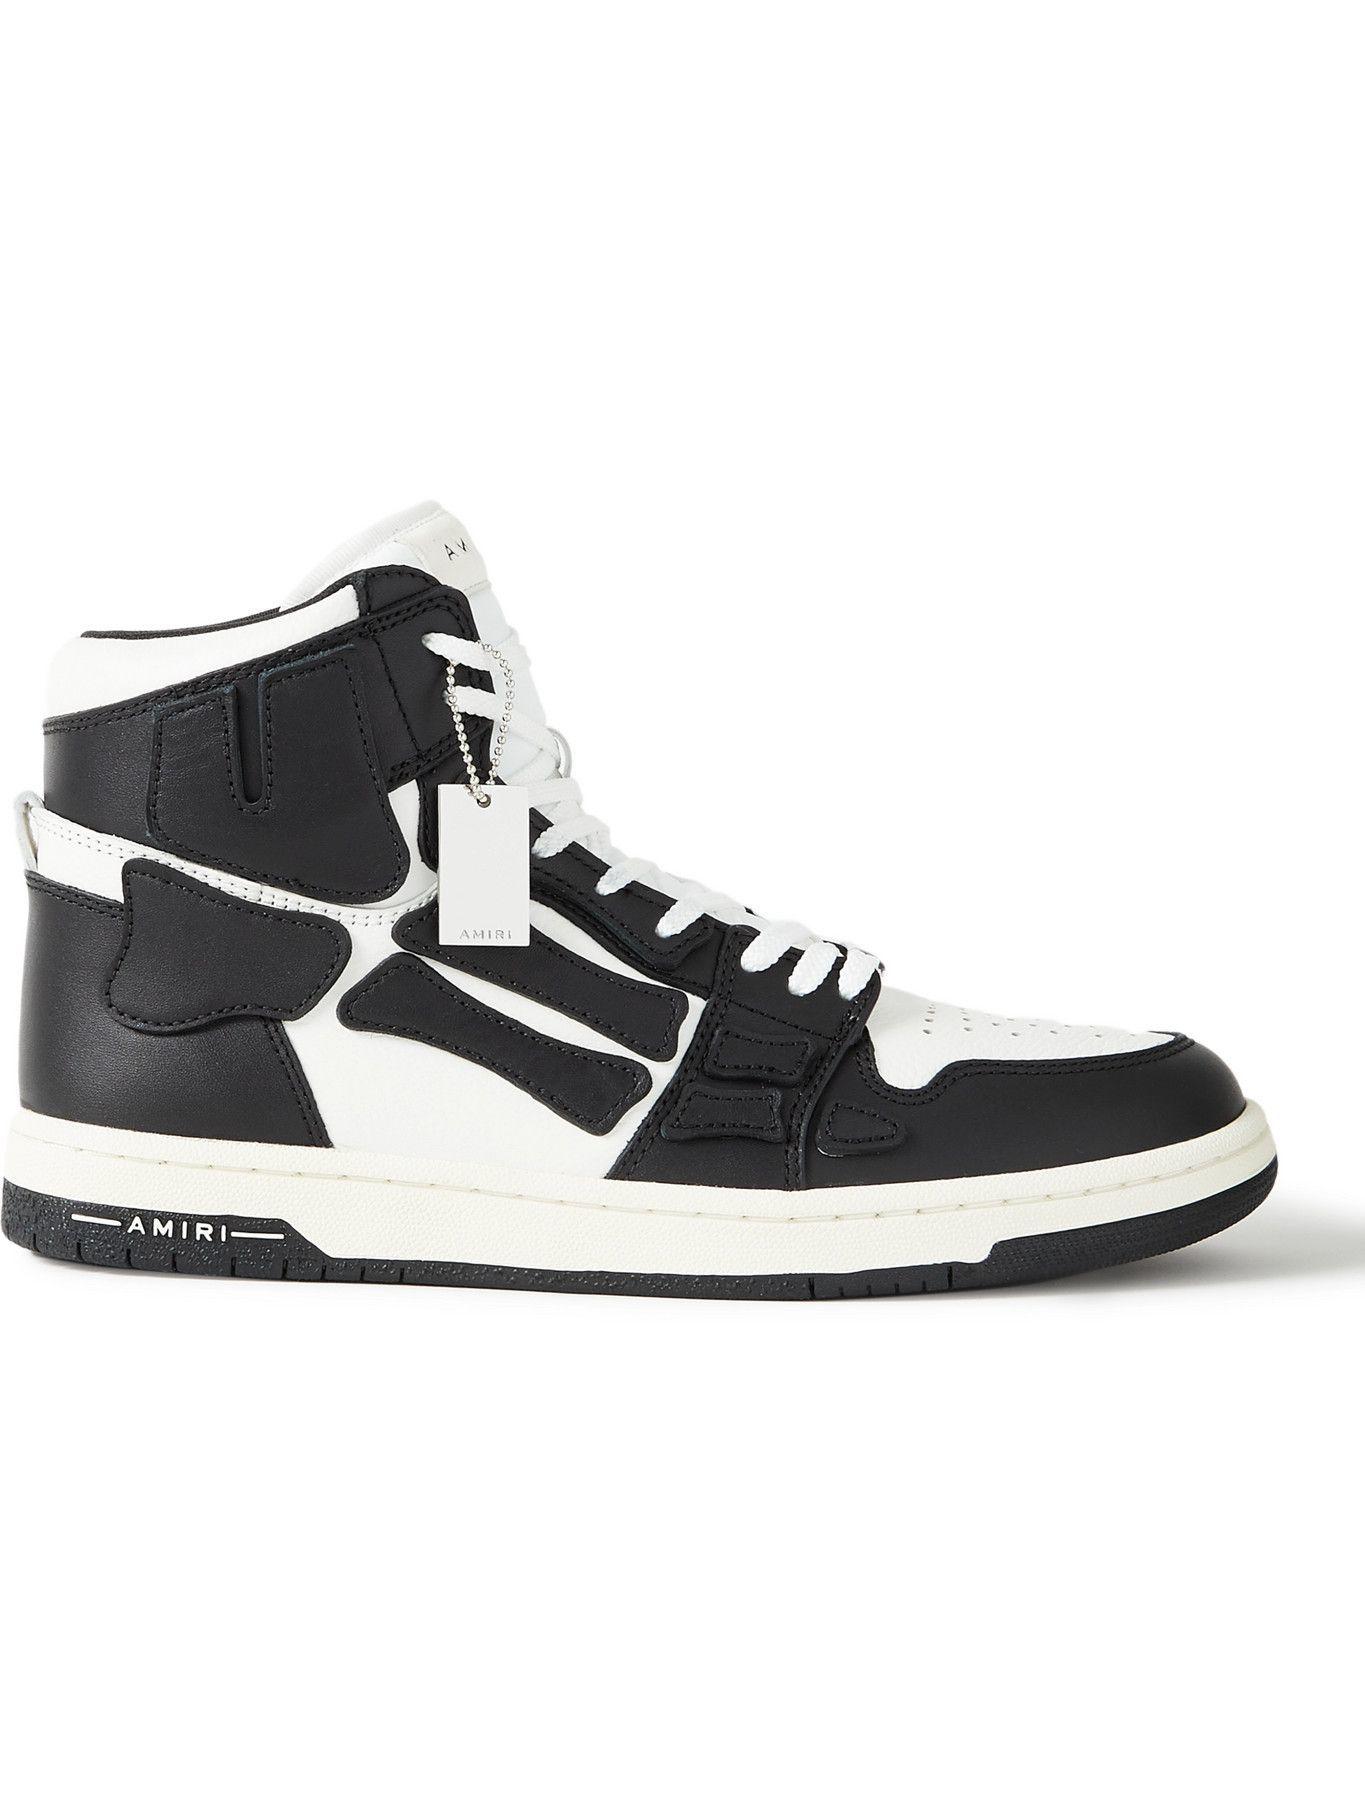 Photo: AMIRI - Skel-Top Colour-Block Leather High-Top Sneakers - Black